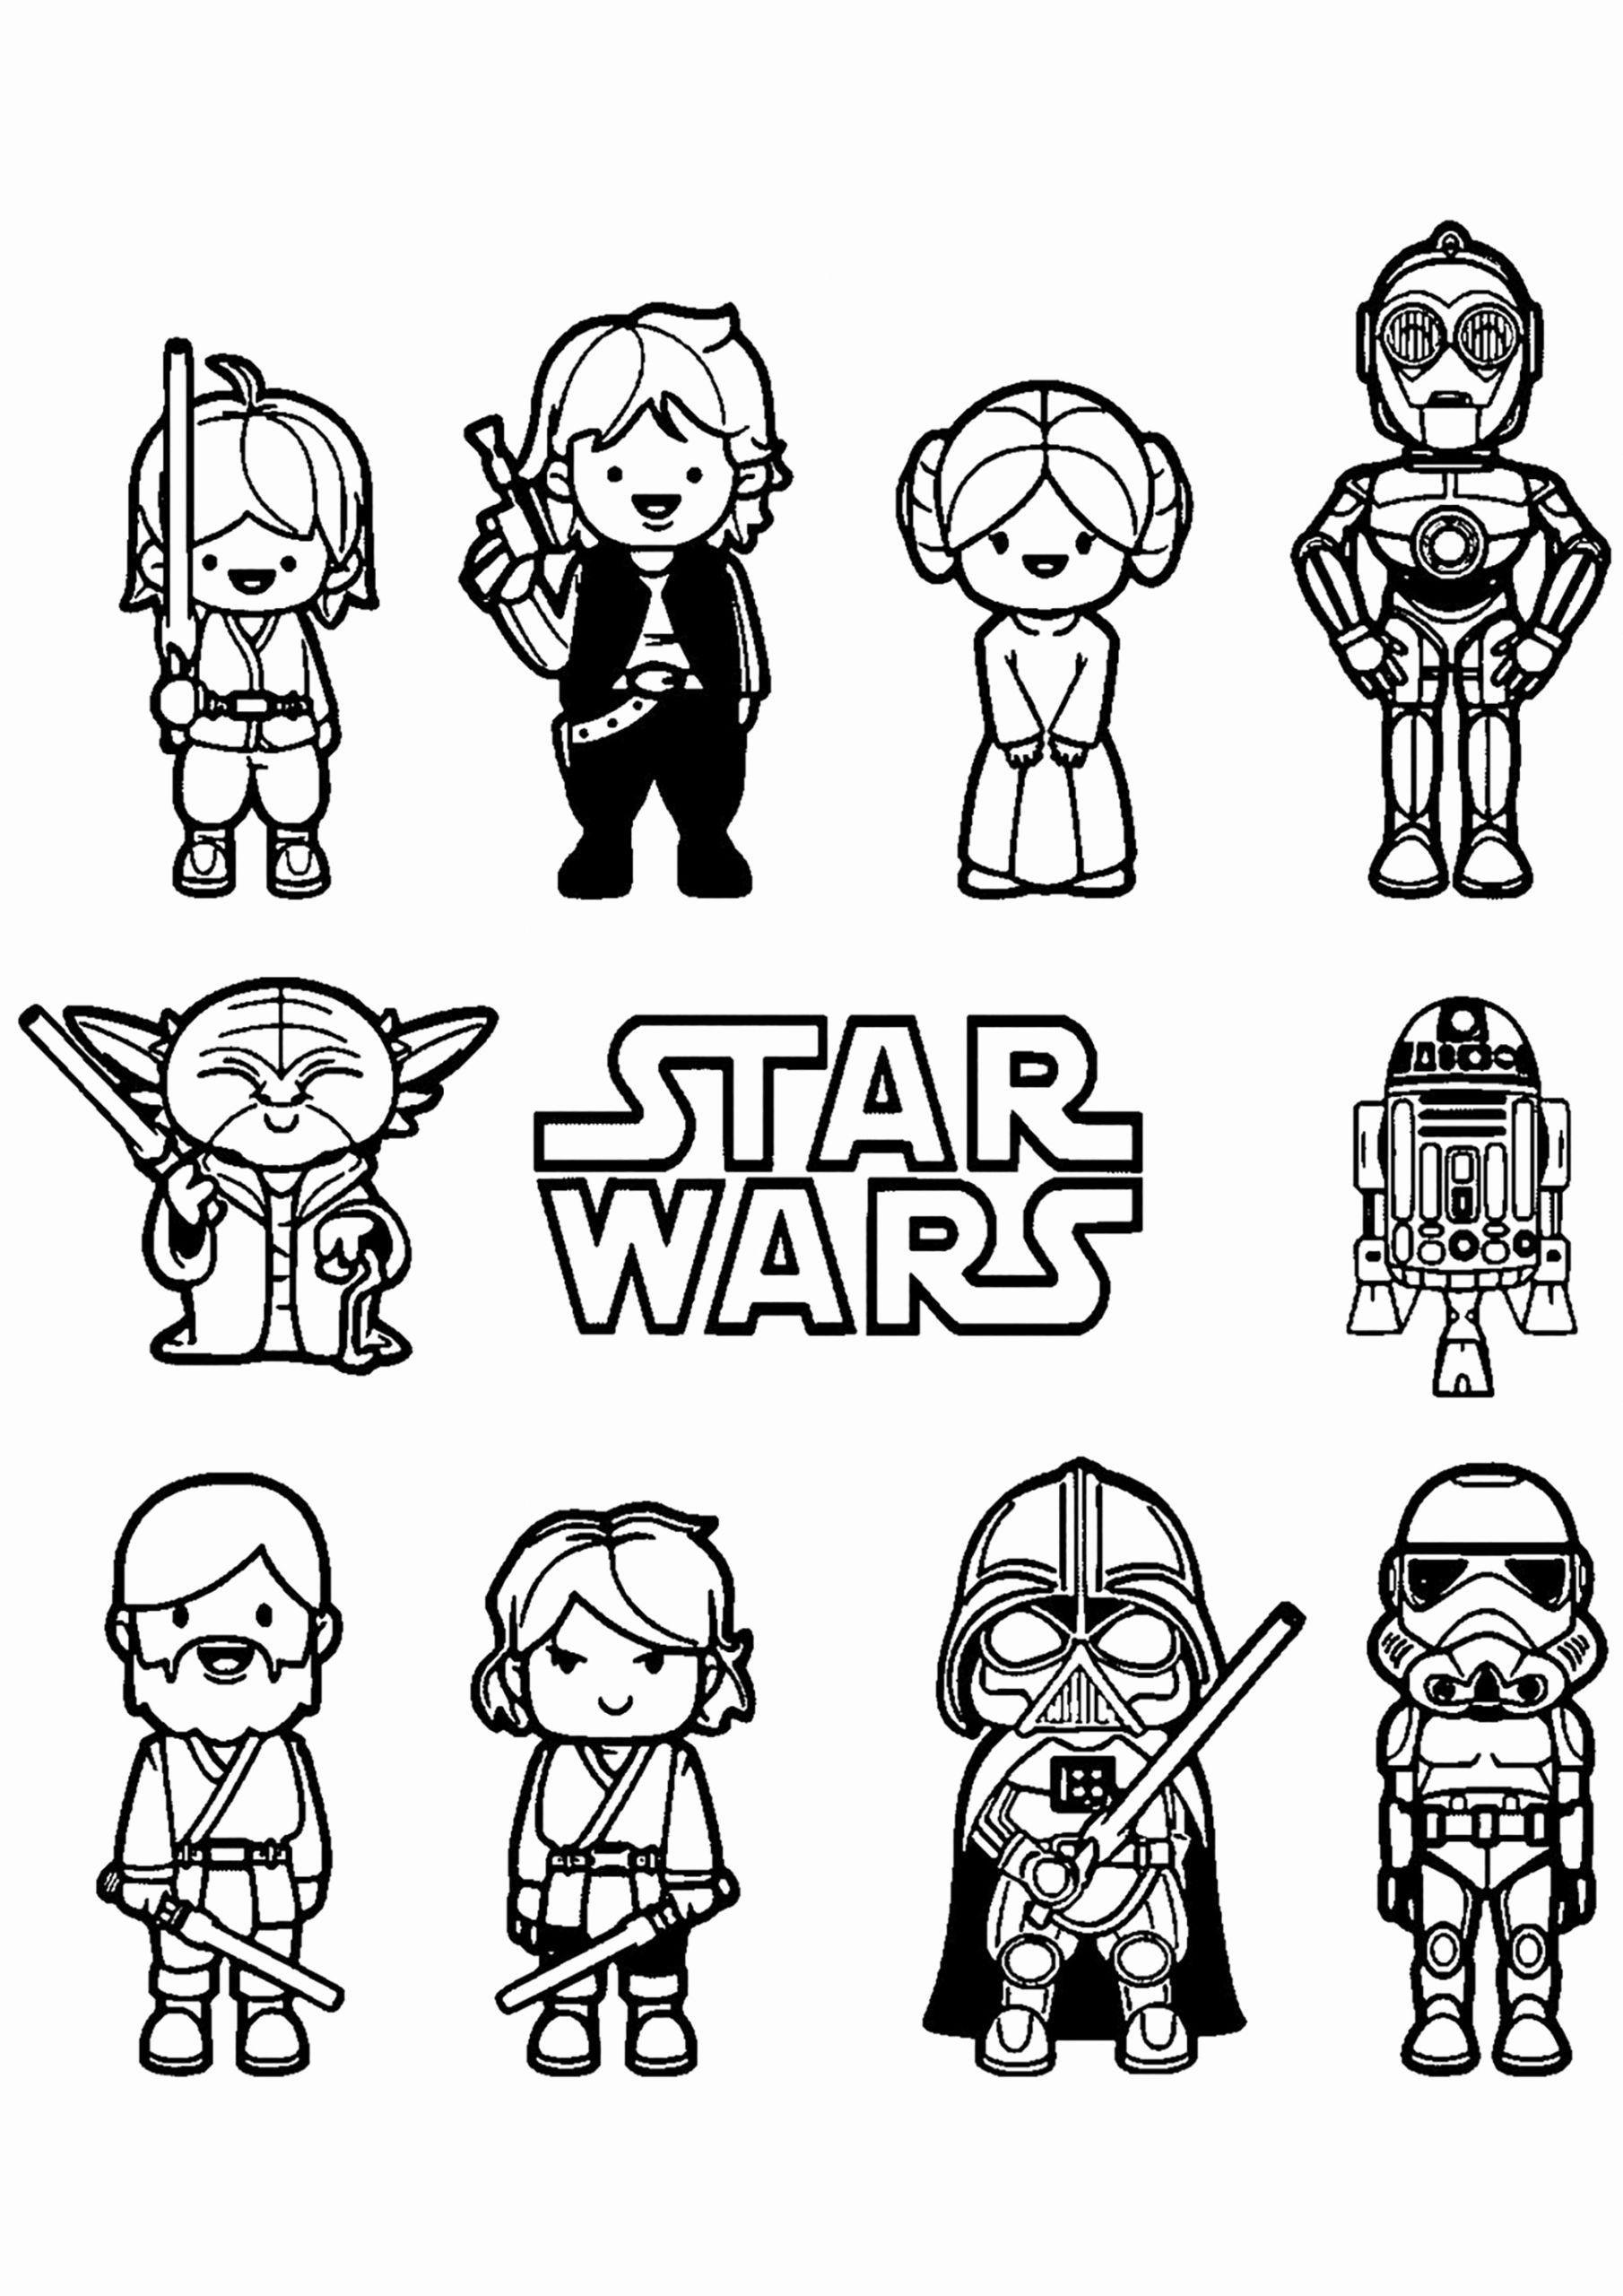 Star Wars Prints Star Wars Gifts 2020 In 2020 Star Wars Coloring Sheet Star Wars Colors Star Wars Cartoon